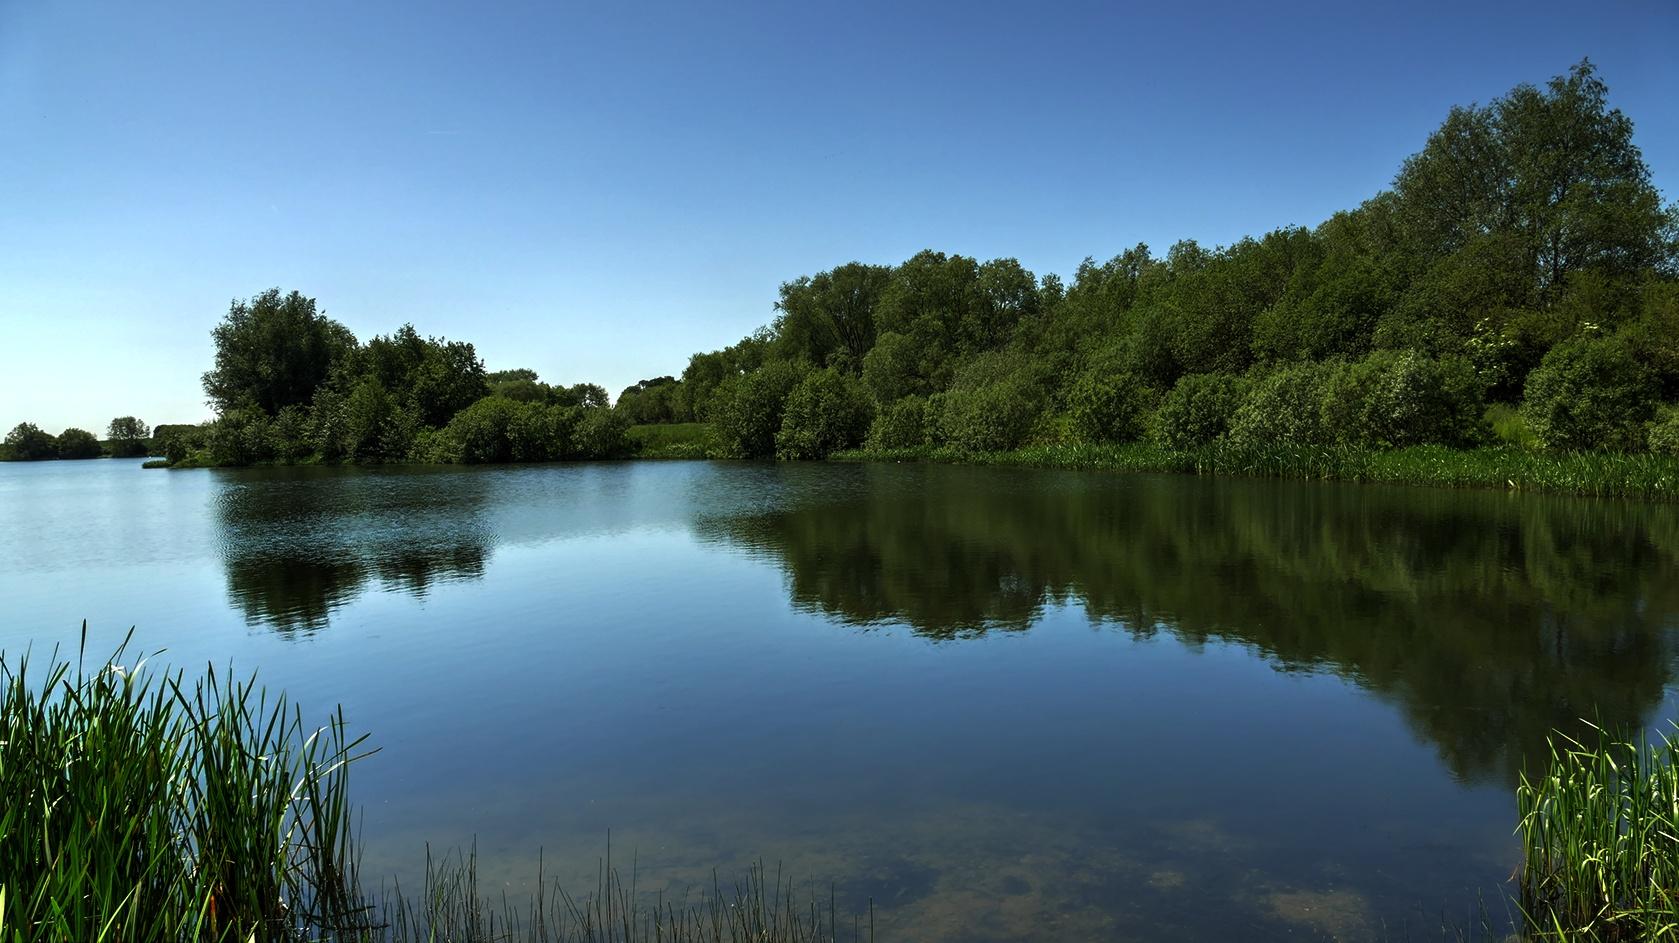 Radwell Pits Lake by Steven Iodice